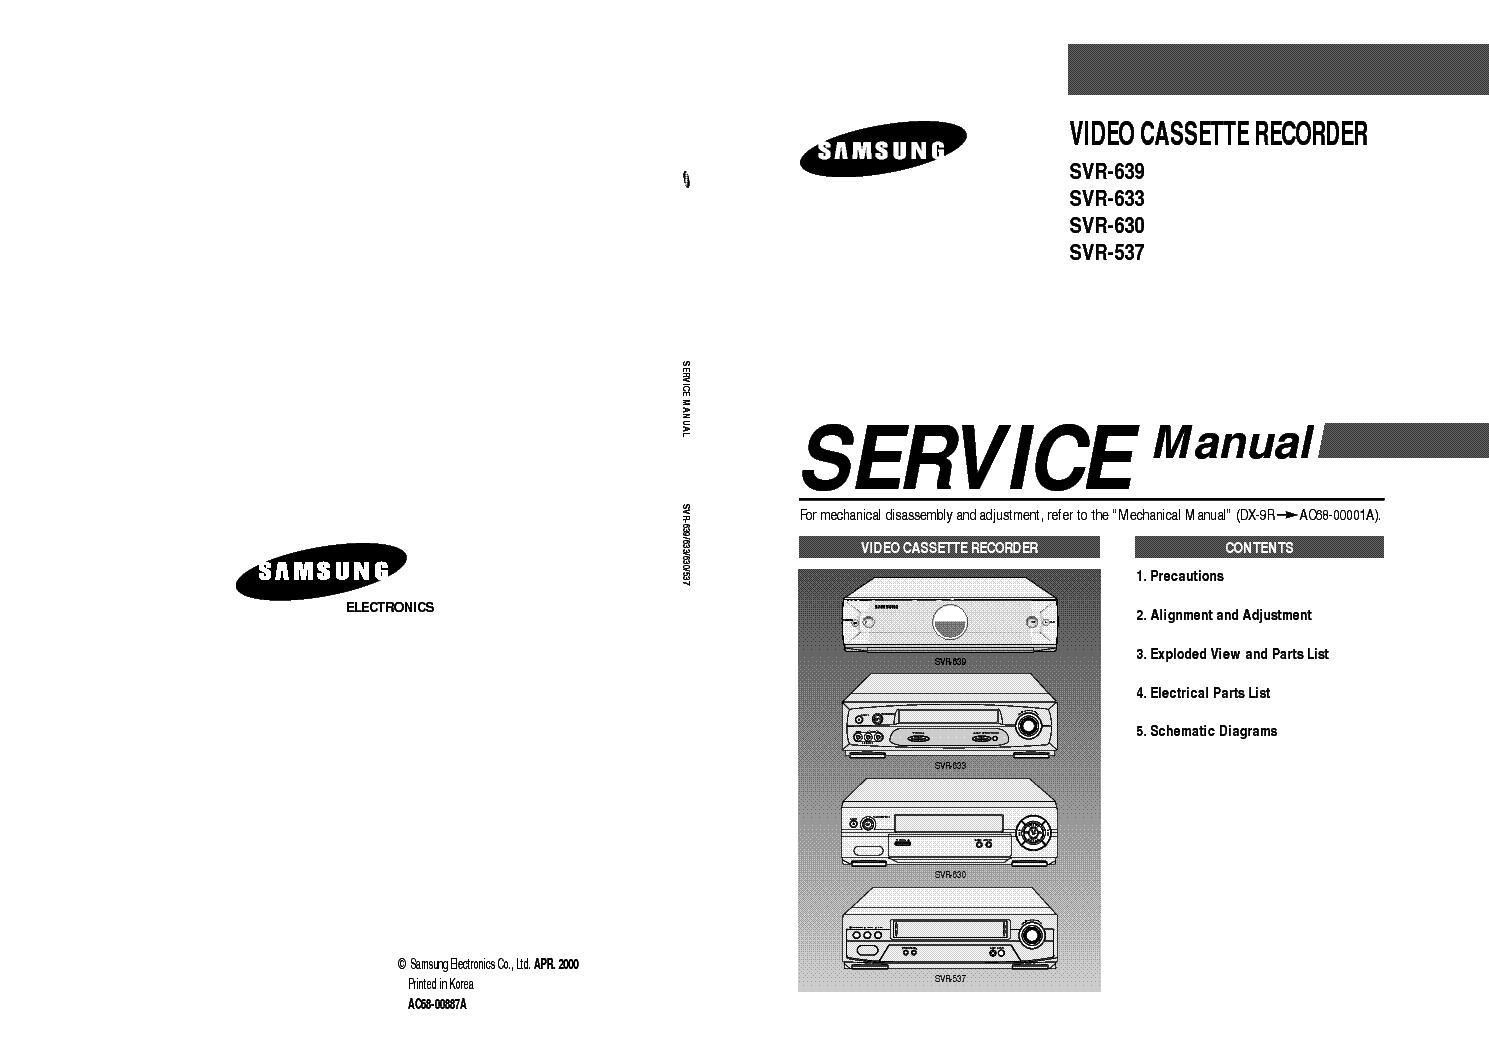 samsung svr 639 svr 633 svr 630 svr 537 vcr service manual download rh elektrotanya com samsung 630 manual samsung 6300 manual